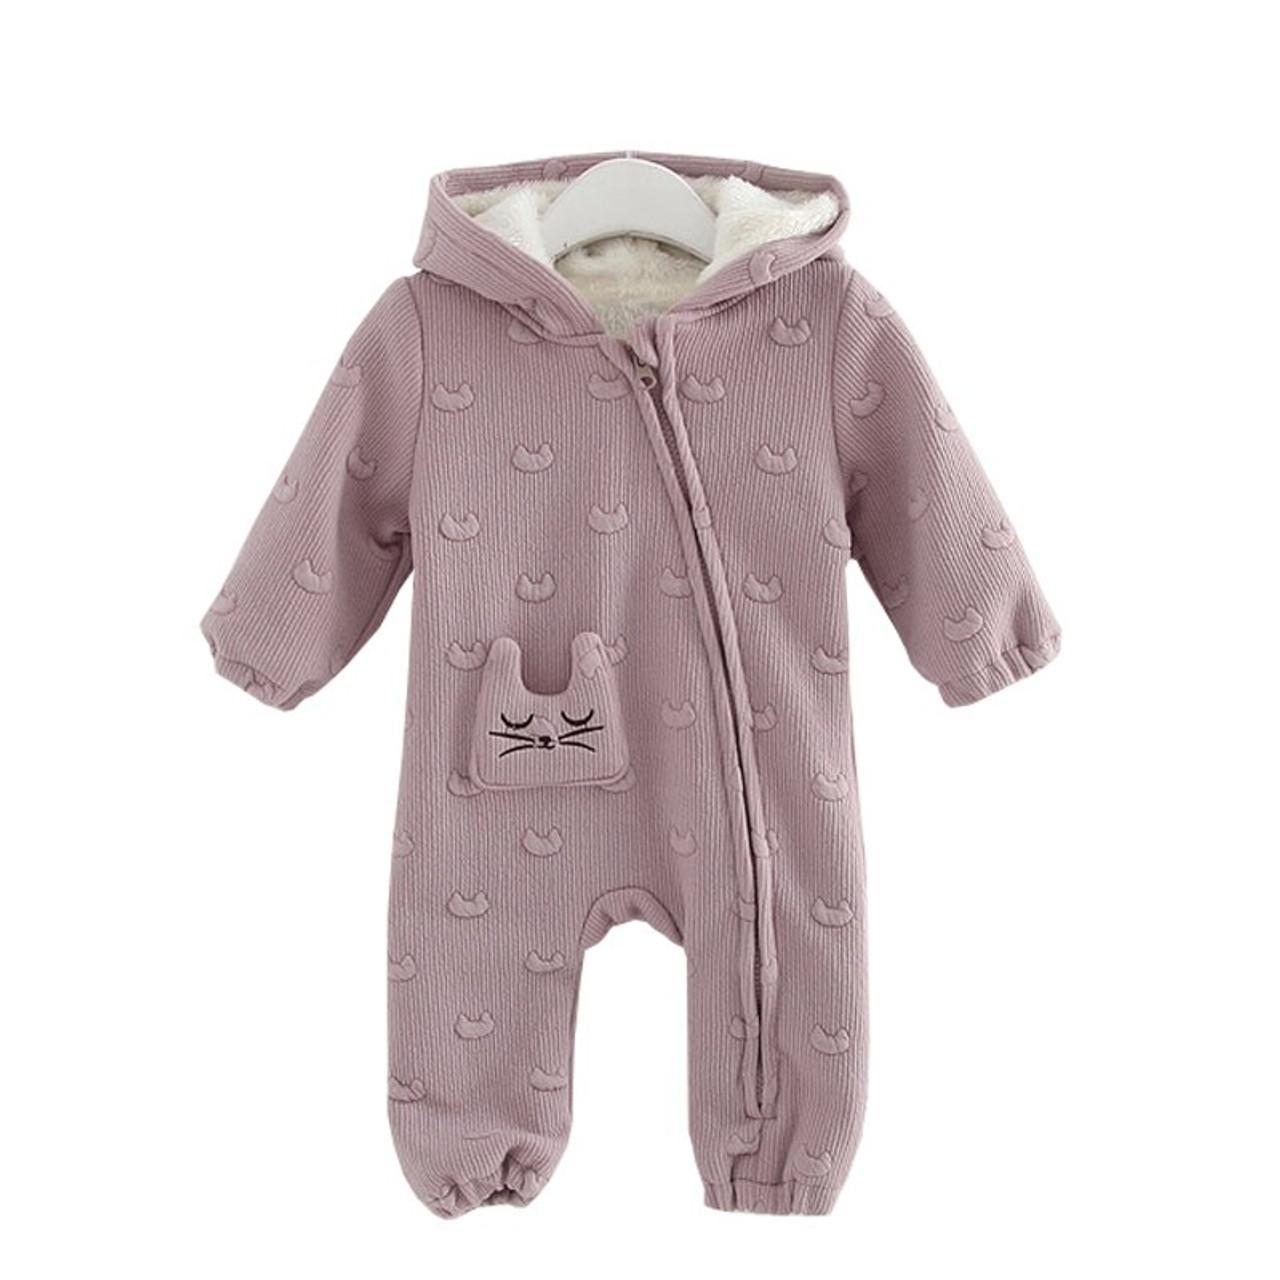 8d7bd156b16c6 Halilo Baby Girl Romper Winter Thicken Warm Christmas Romper Newborn  Clothing Baby Boy Rompers Hooded Boys Girls Jumpsuit 2018